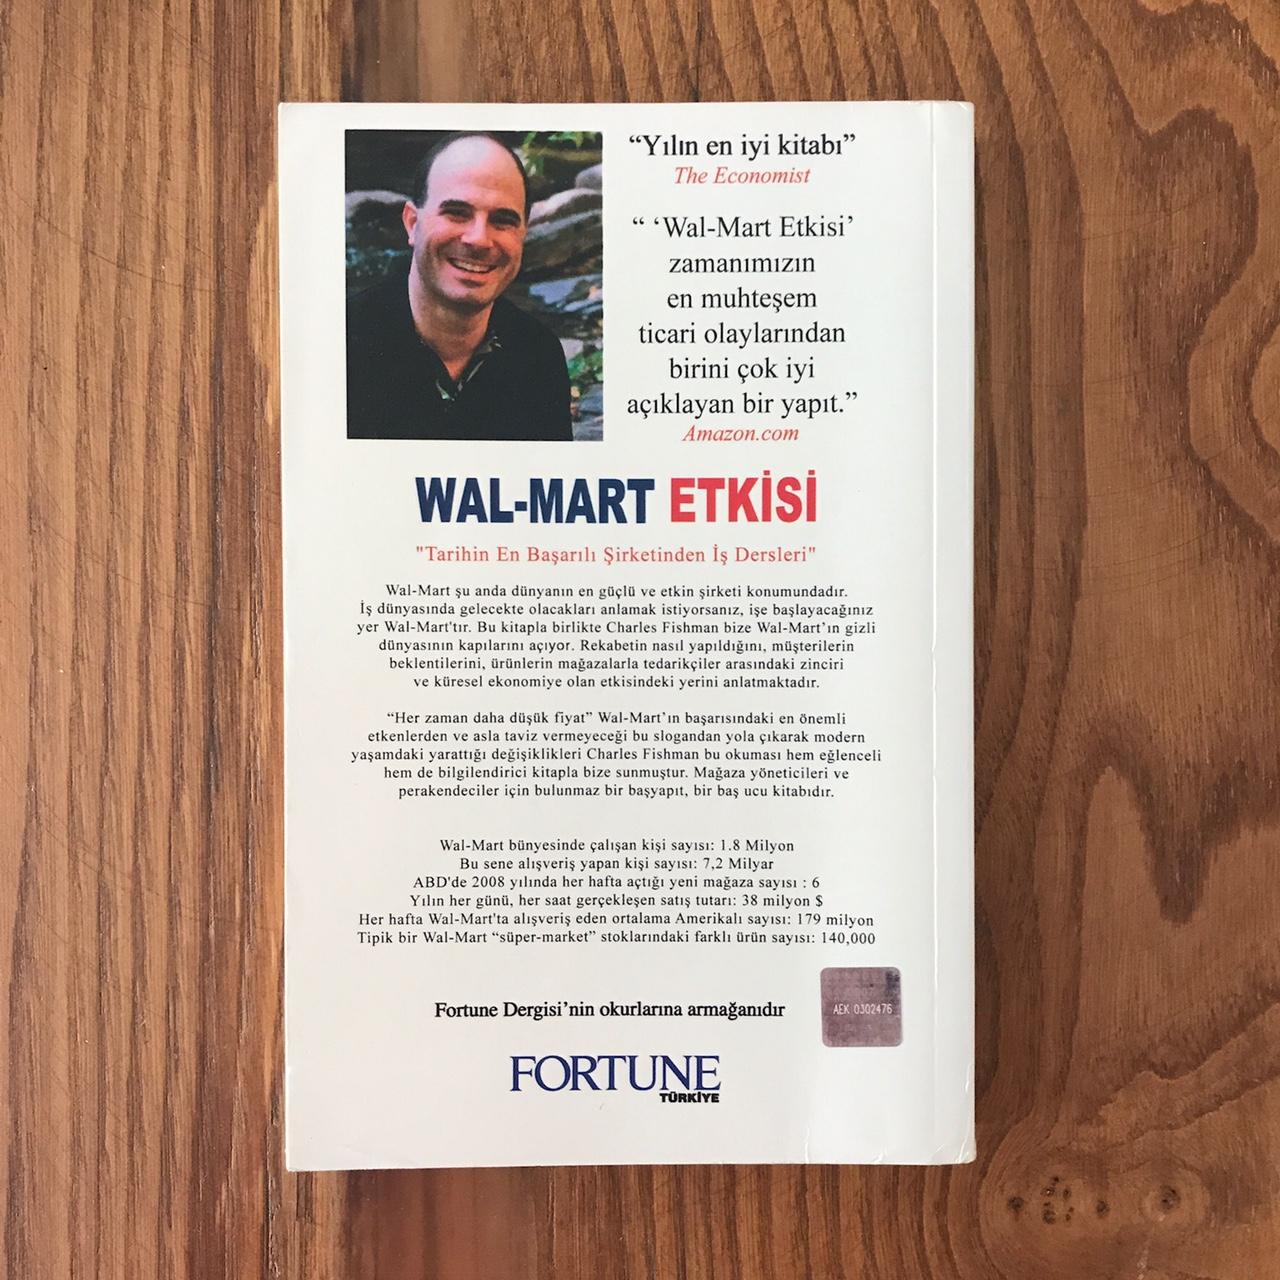 WalMart Etkisi - Dunya'nin En Buyuk Sirketinin Oykusu (Video) (Kitap) Arka Kapak